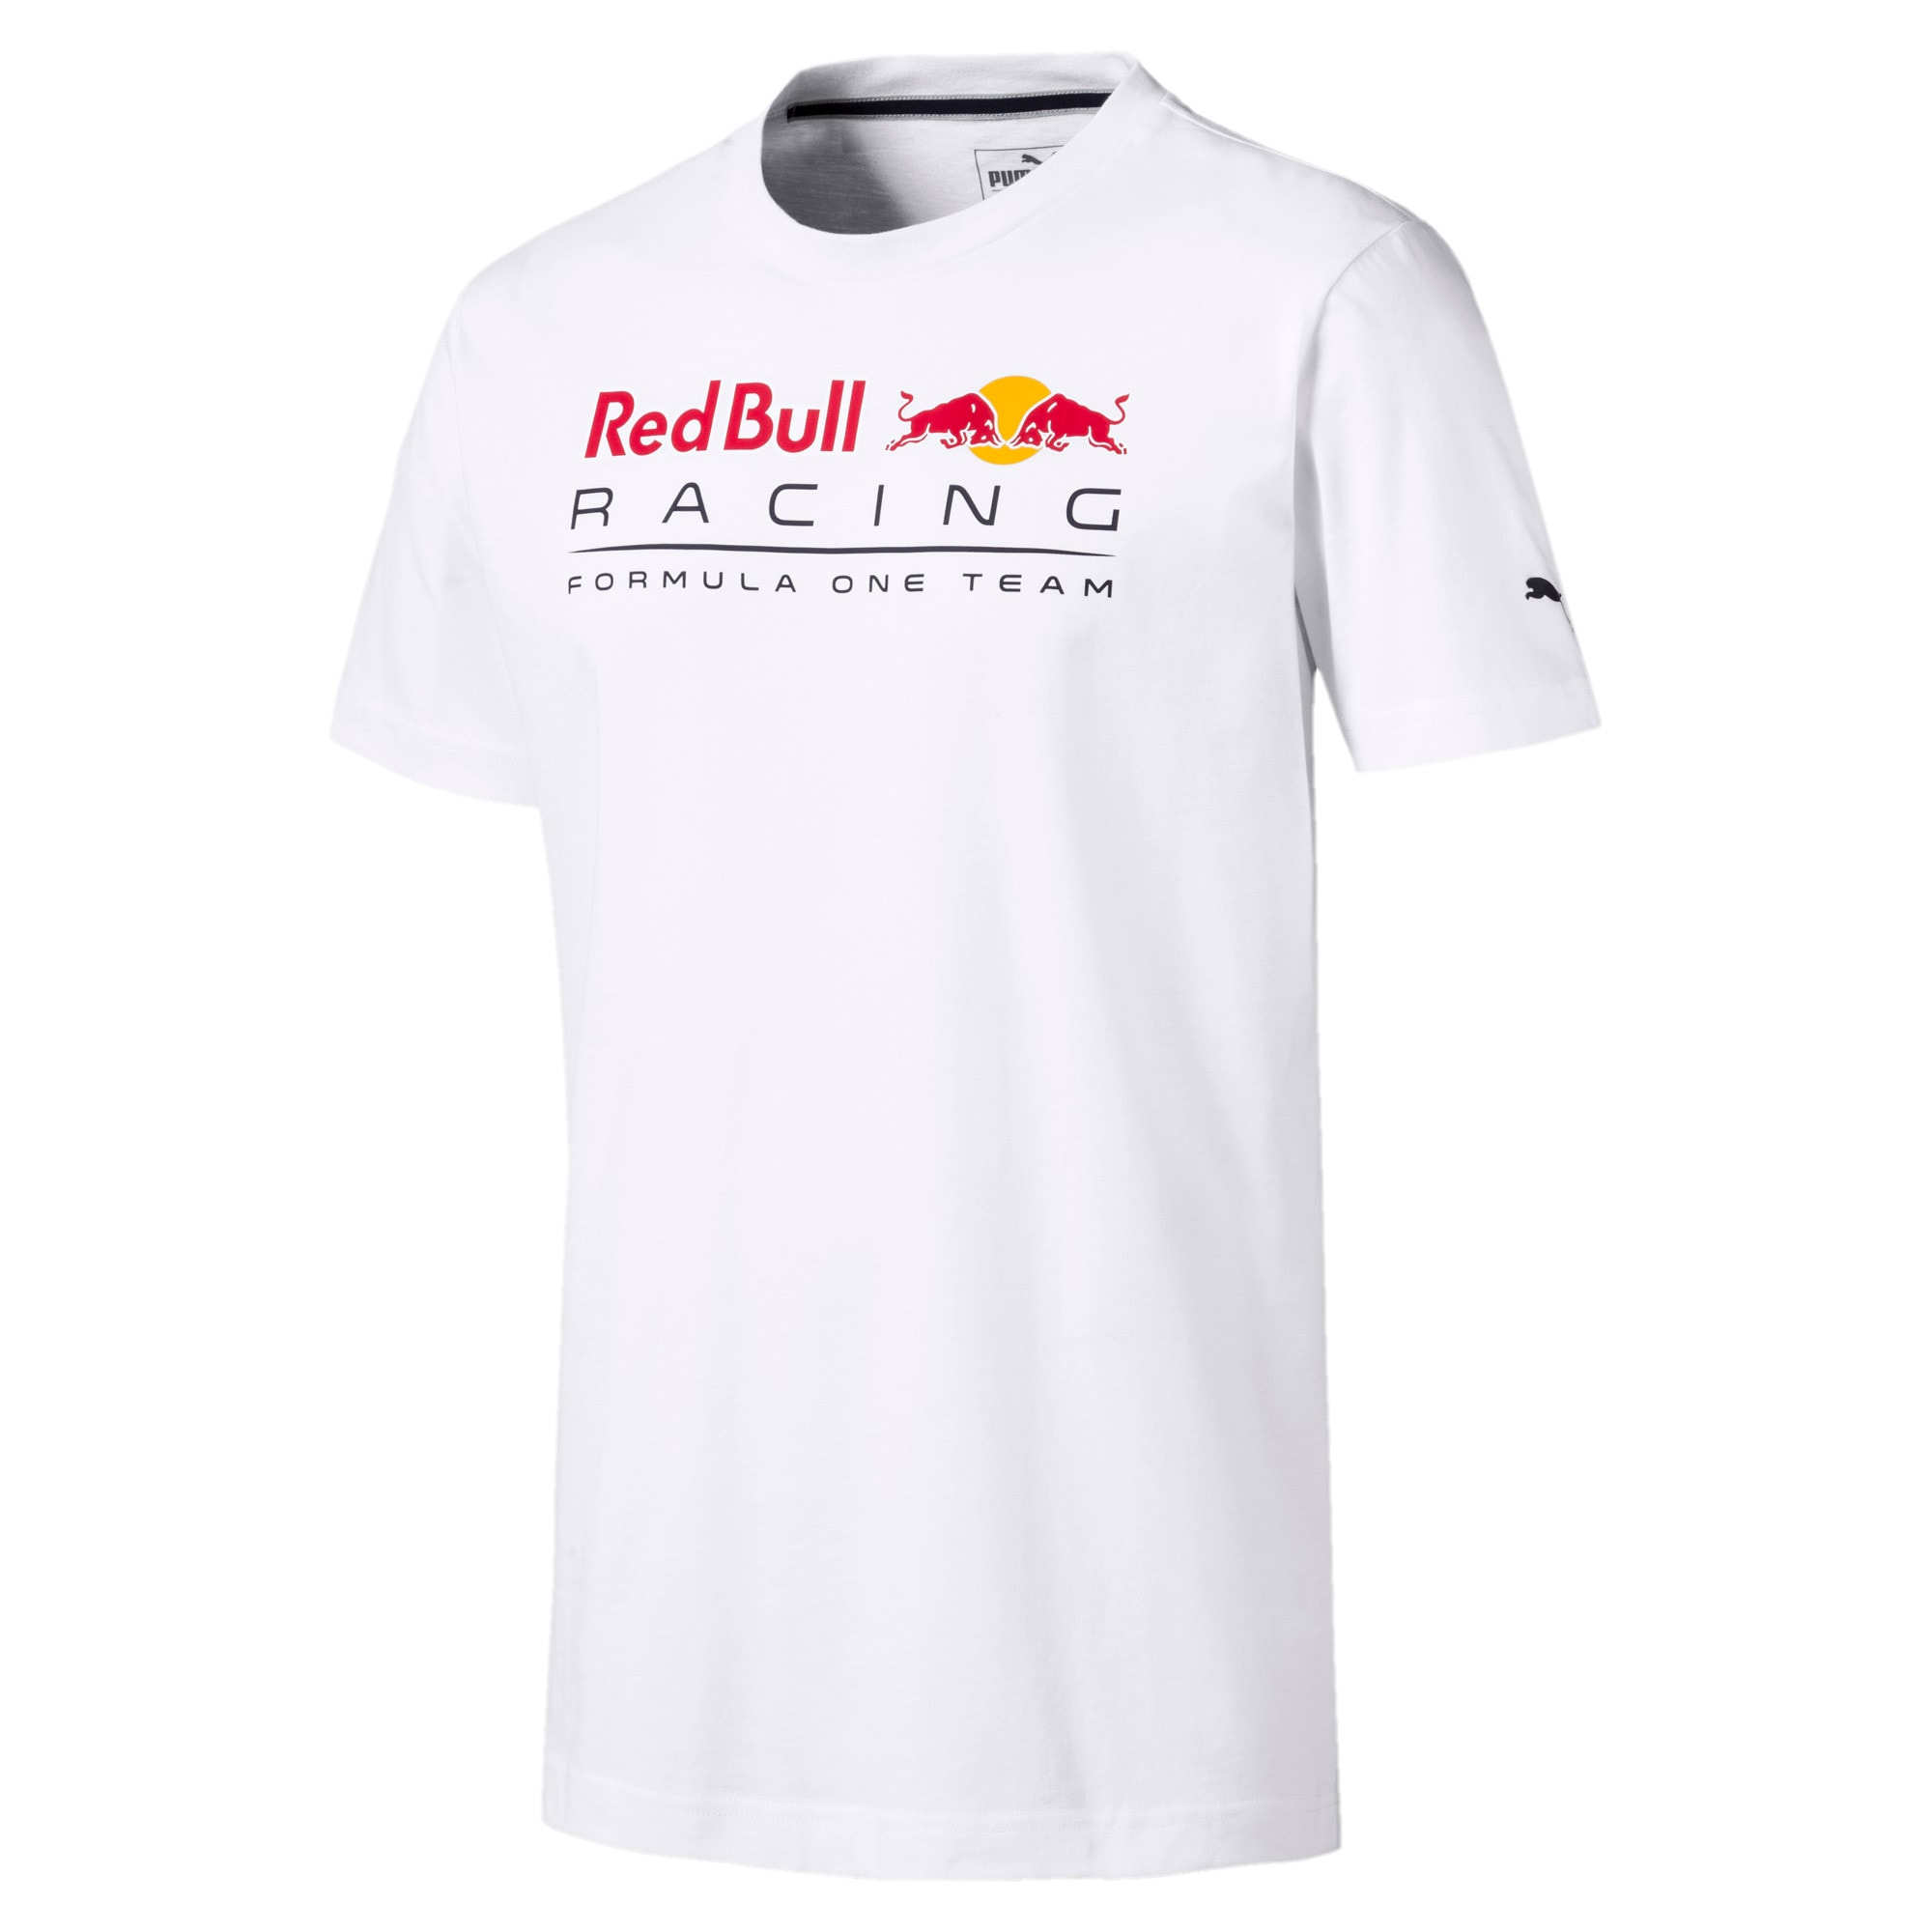 Thumbnail 4 of Red Bull Racing Logo Men's Tee, Puma White, medium